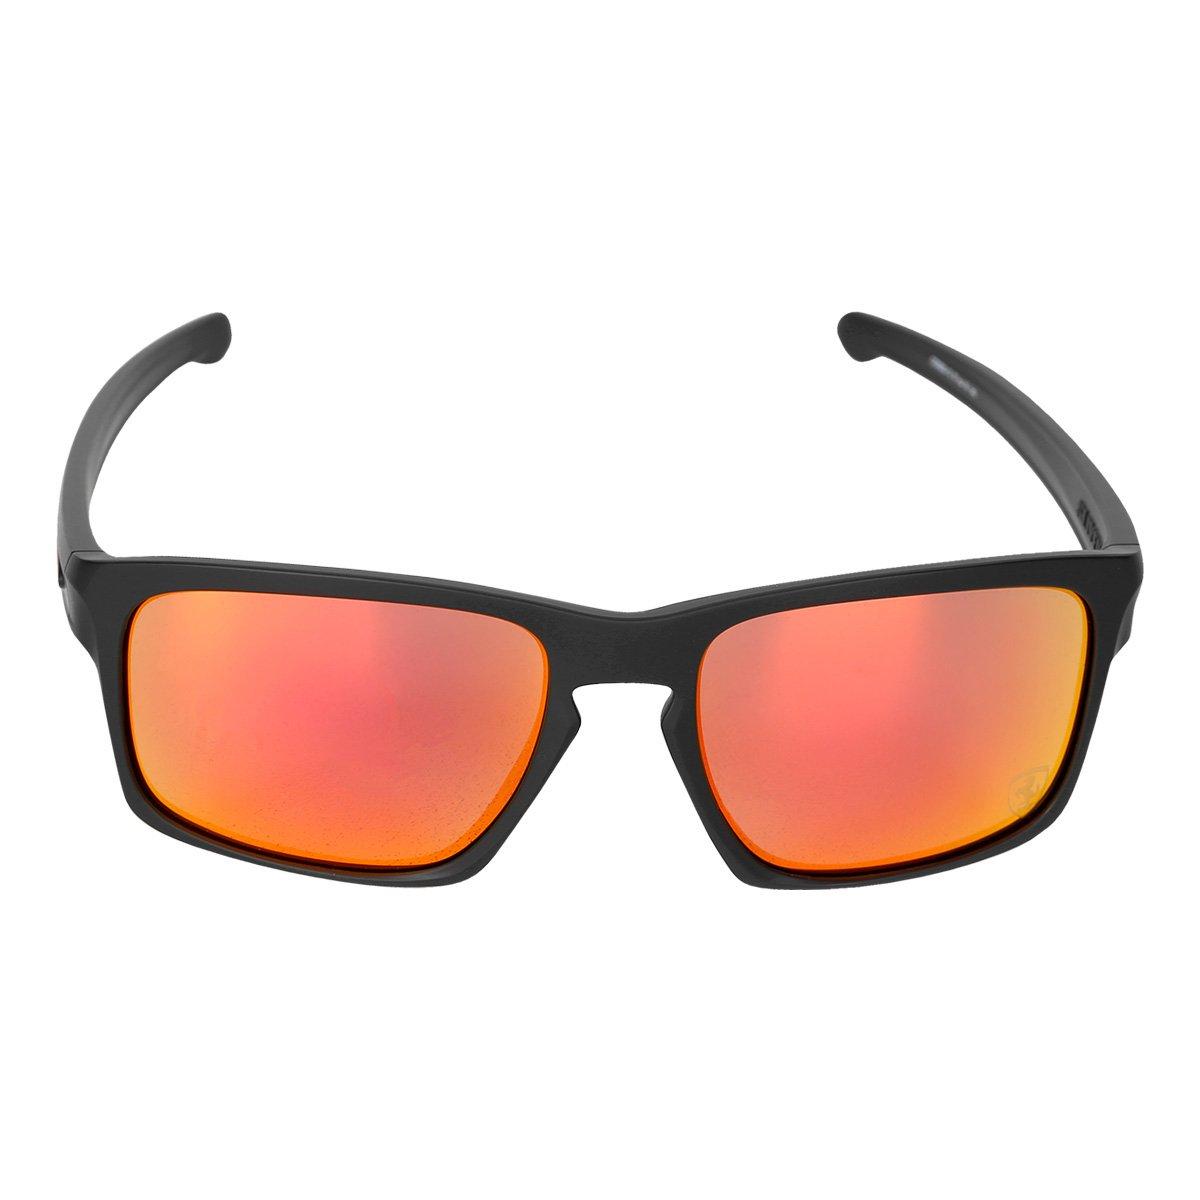 0aa61ae2b21f6 Óculos Oakley Ferrari Sliver Matte - Iridium - Compre Agora   Netshoes